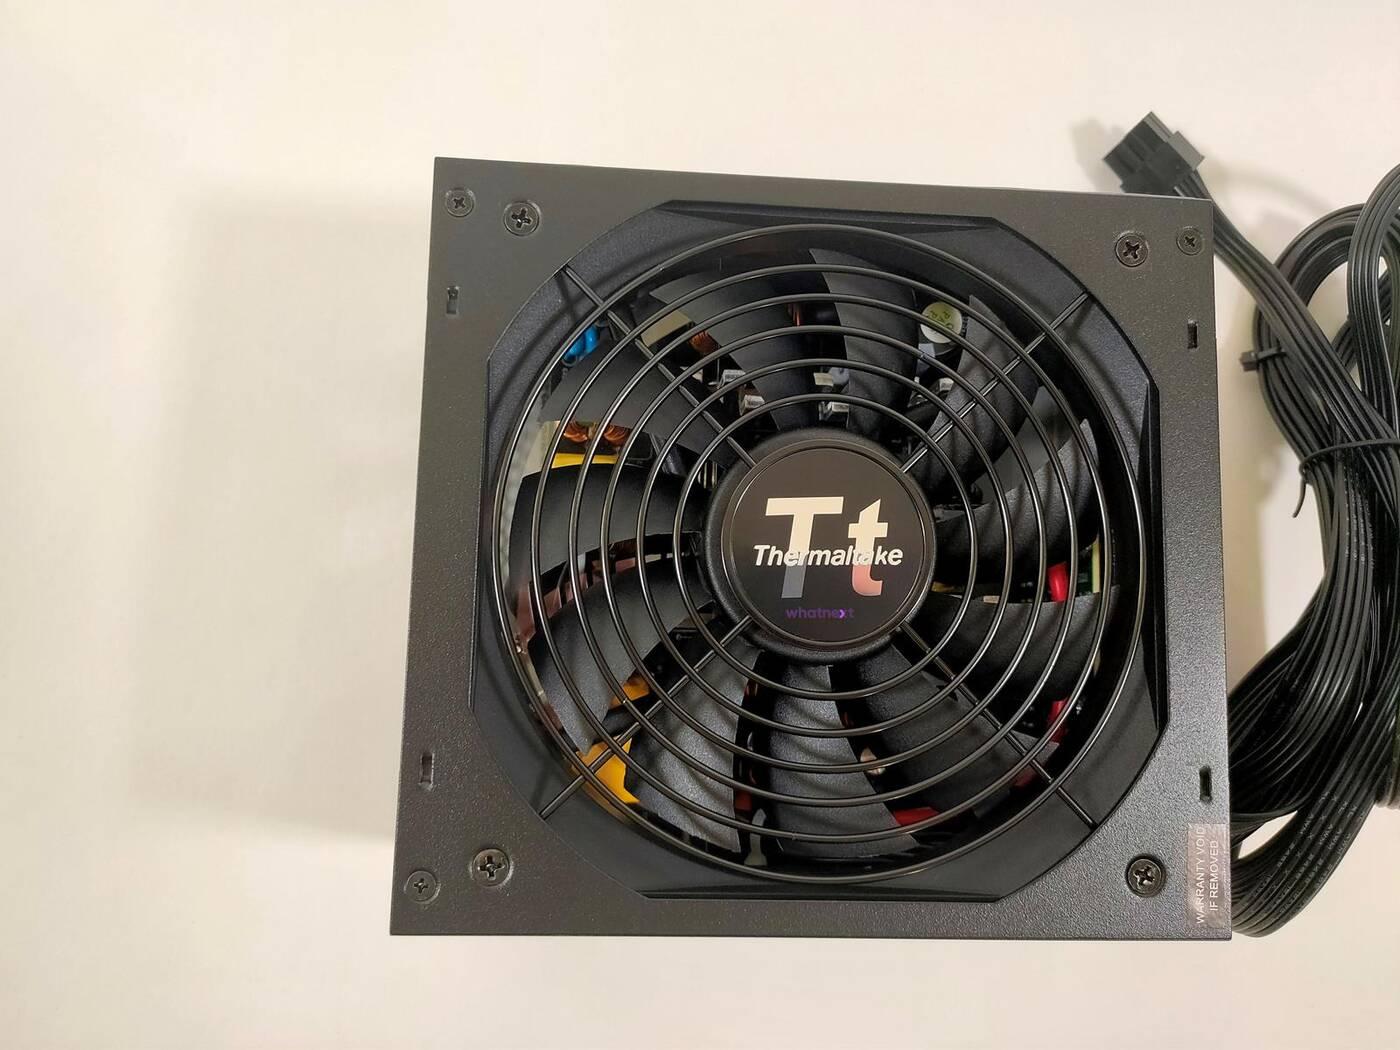 test Thermaltake Smart SE2 500W, recenzja Thermaltake Smart SE2 500W, review Thermaltake Smart SE2 500W opinia Thermaltake Smart SE2 500W